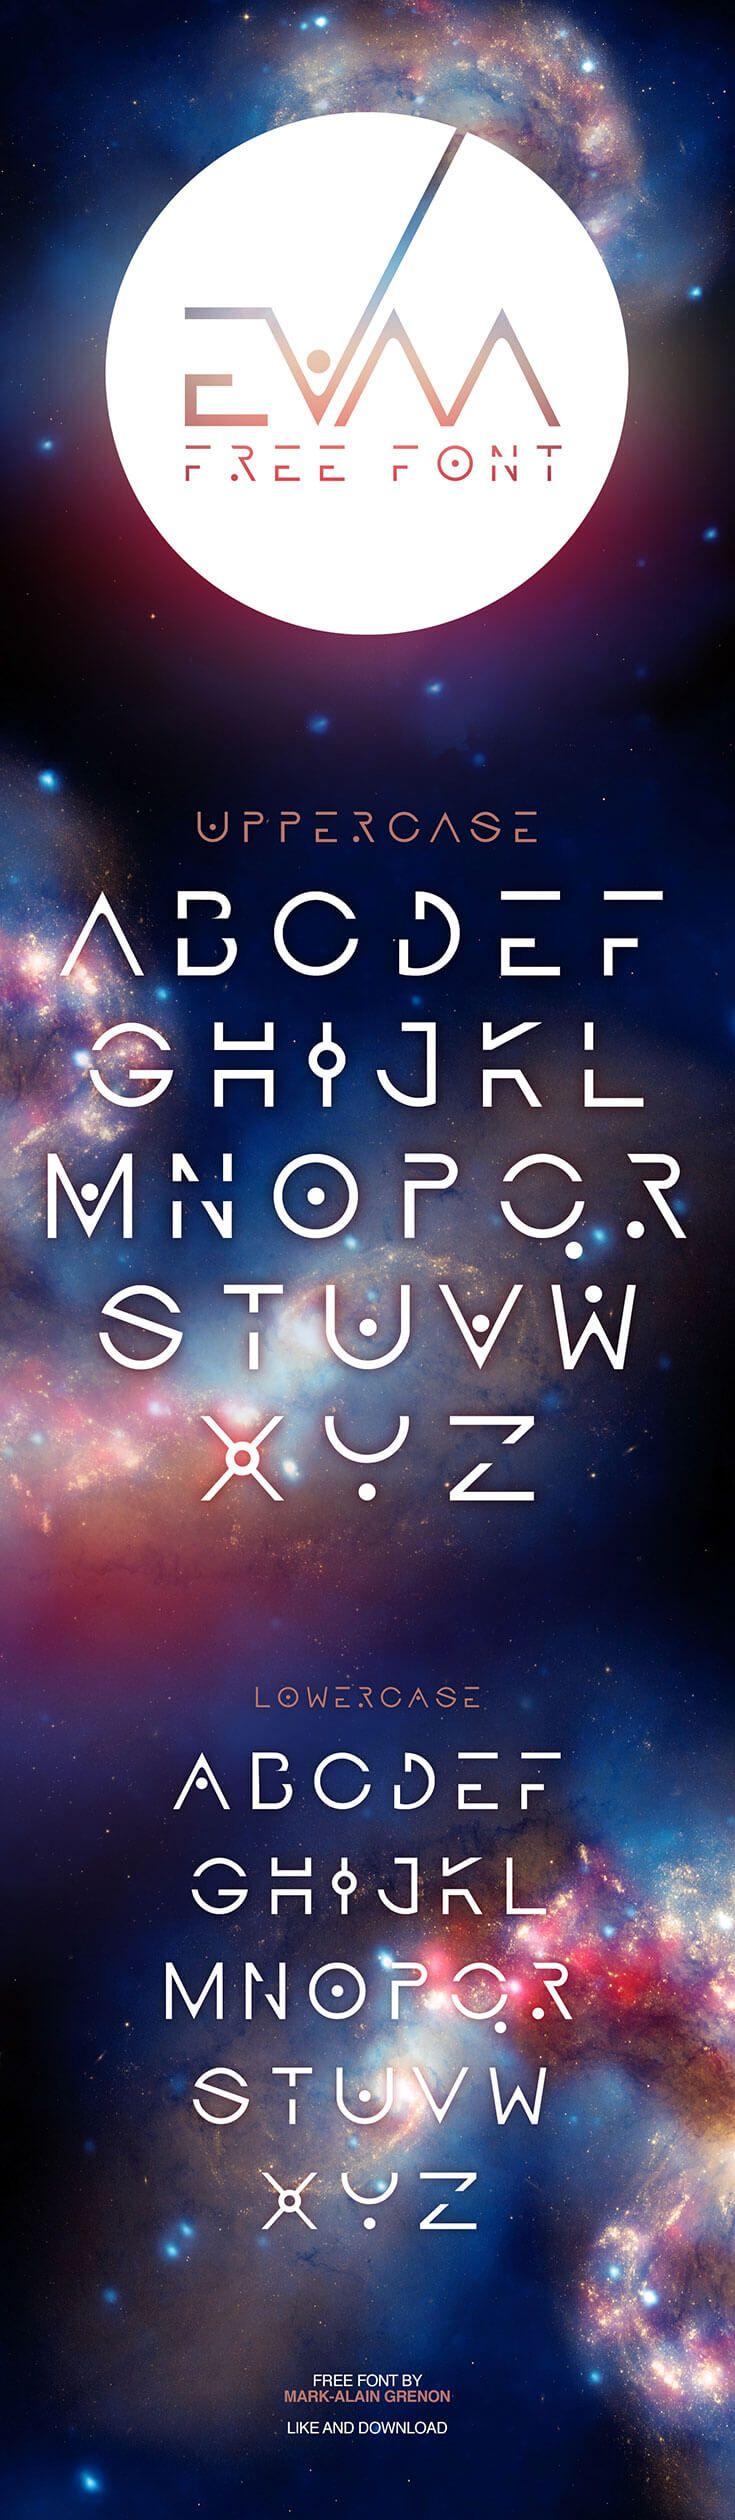 Free Evaa Galactic Display Font Fonts, Elegant logo